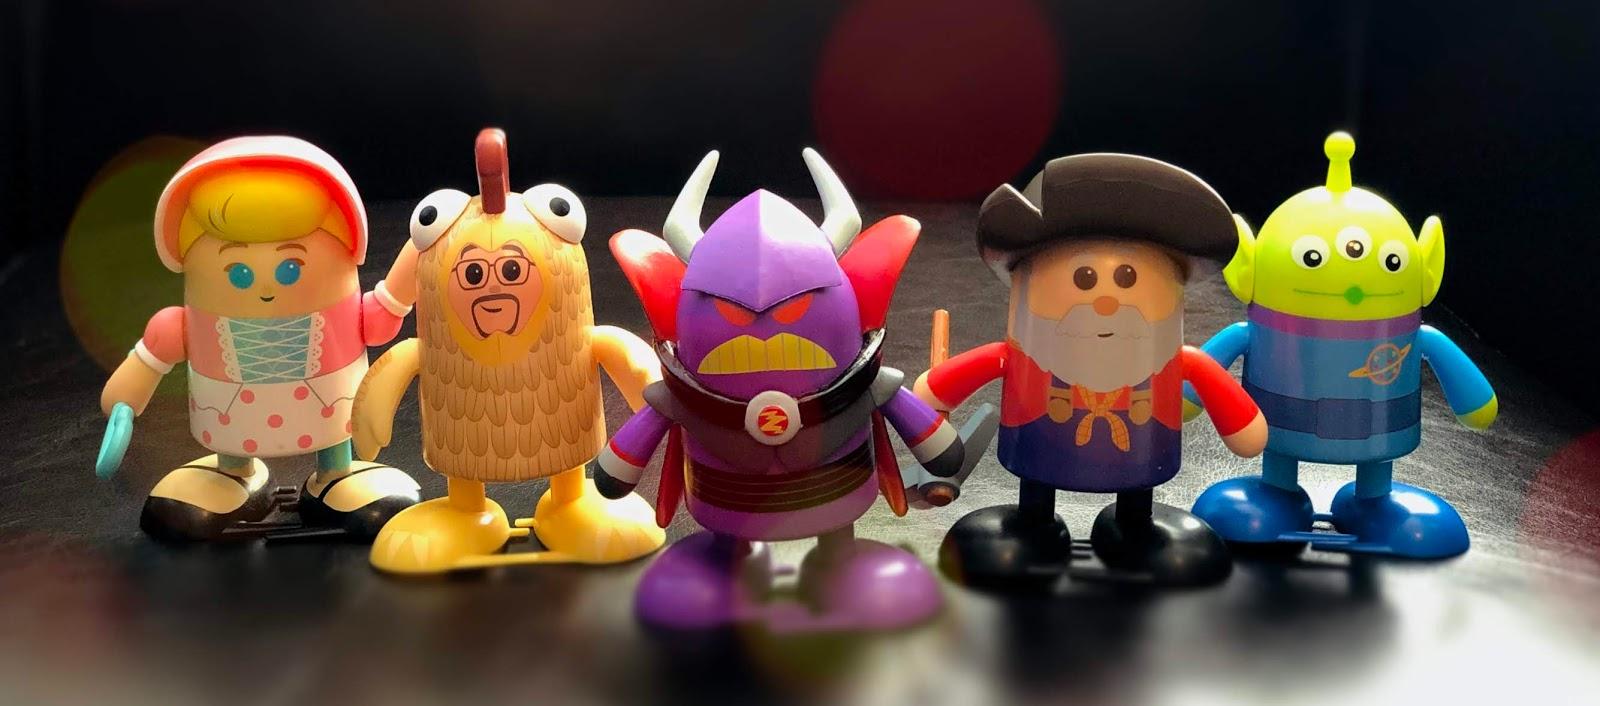 Disney Store Toy Story 2 Stinky Pete The Prospector Shufflerz Figure Toy New